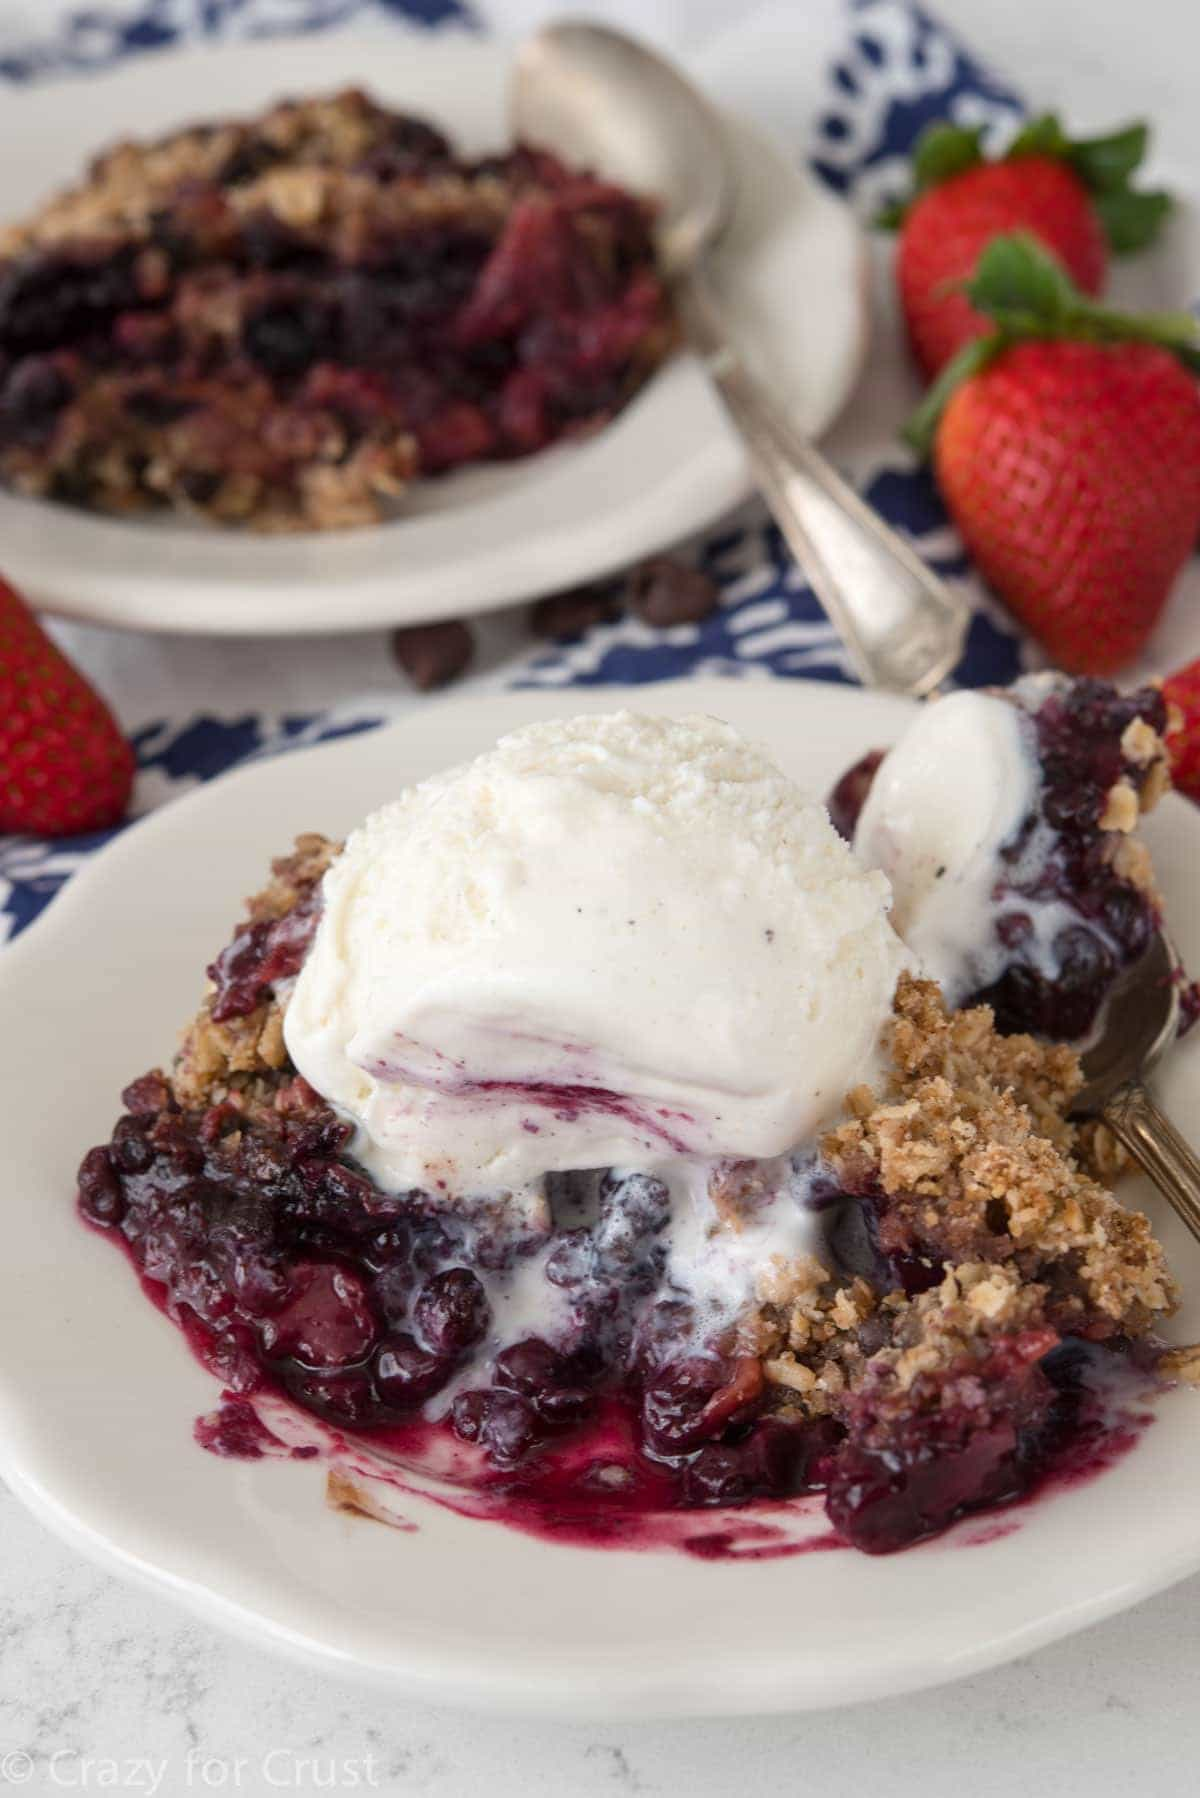 EASY Crockpot Berry Crumble Recipe